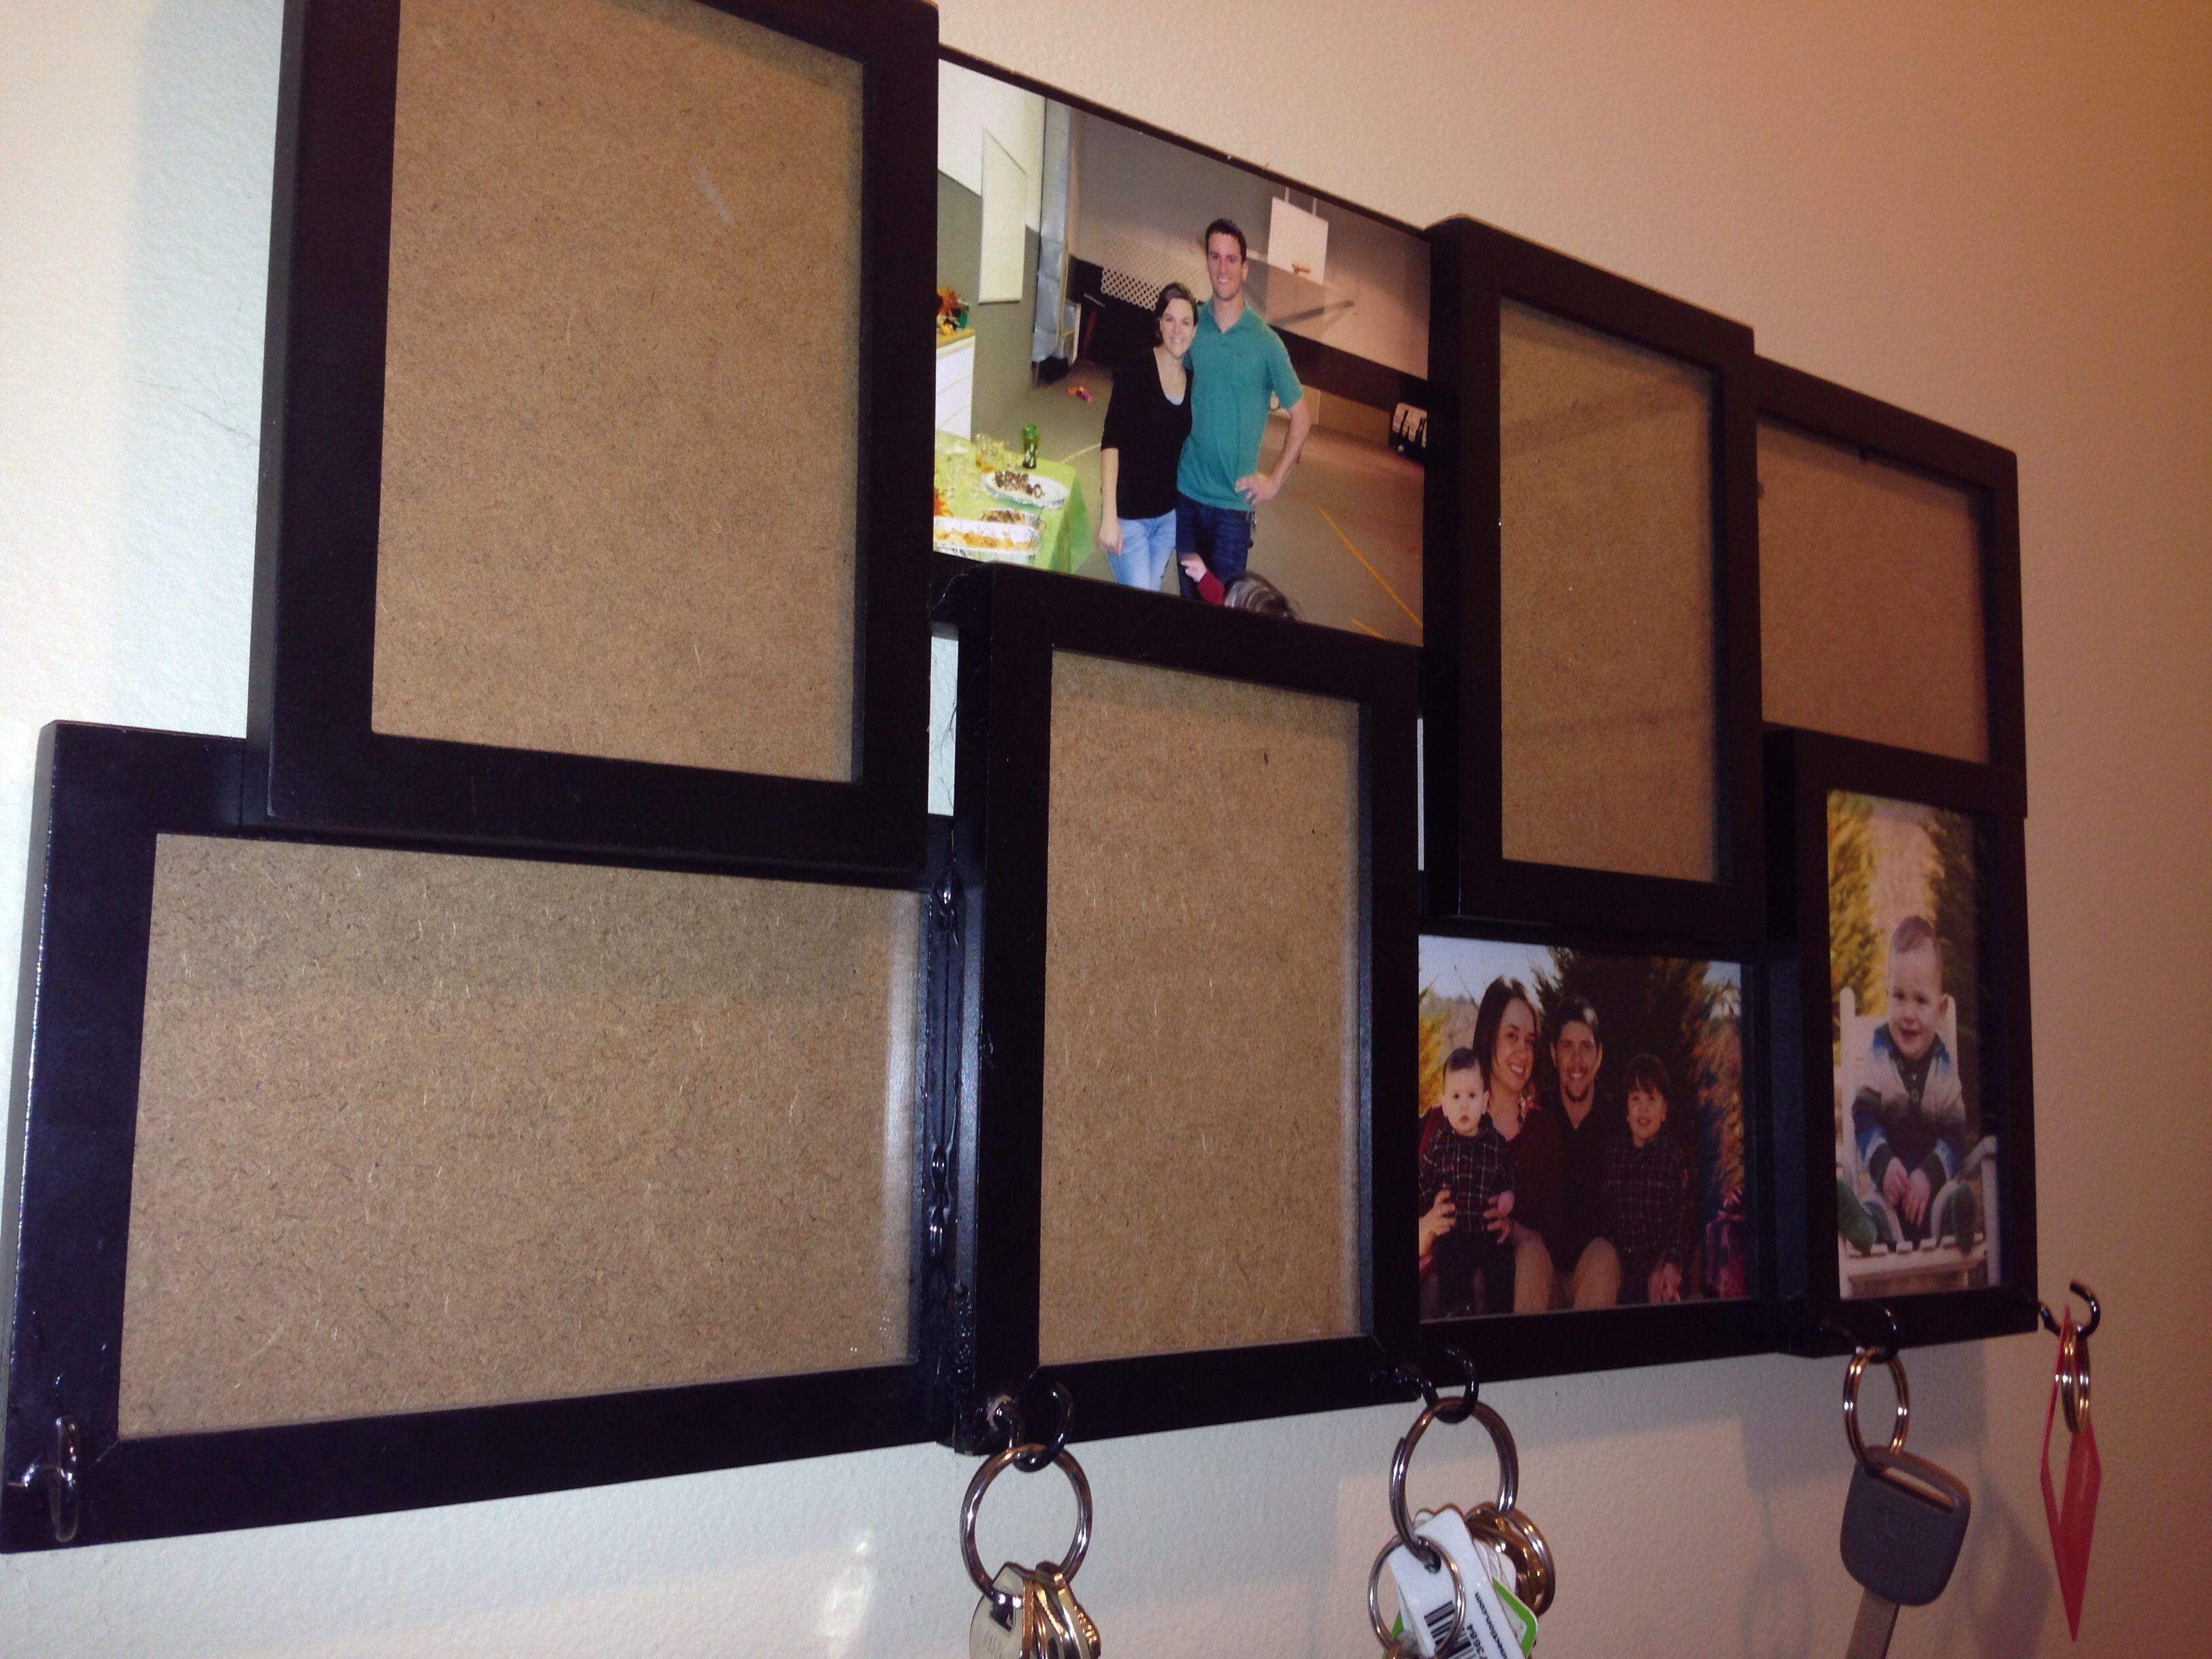 Add hooks to multi photo frame to hang keys crafty crafty